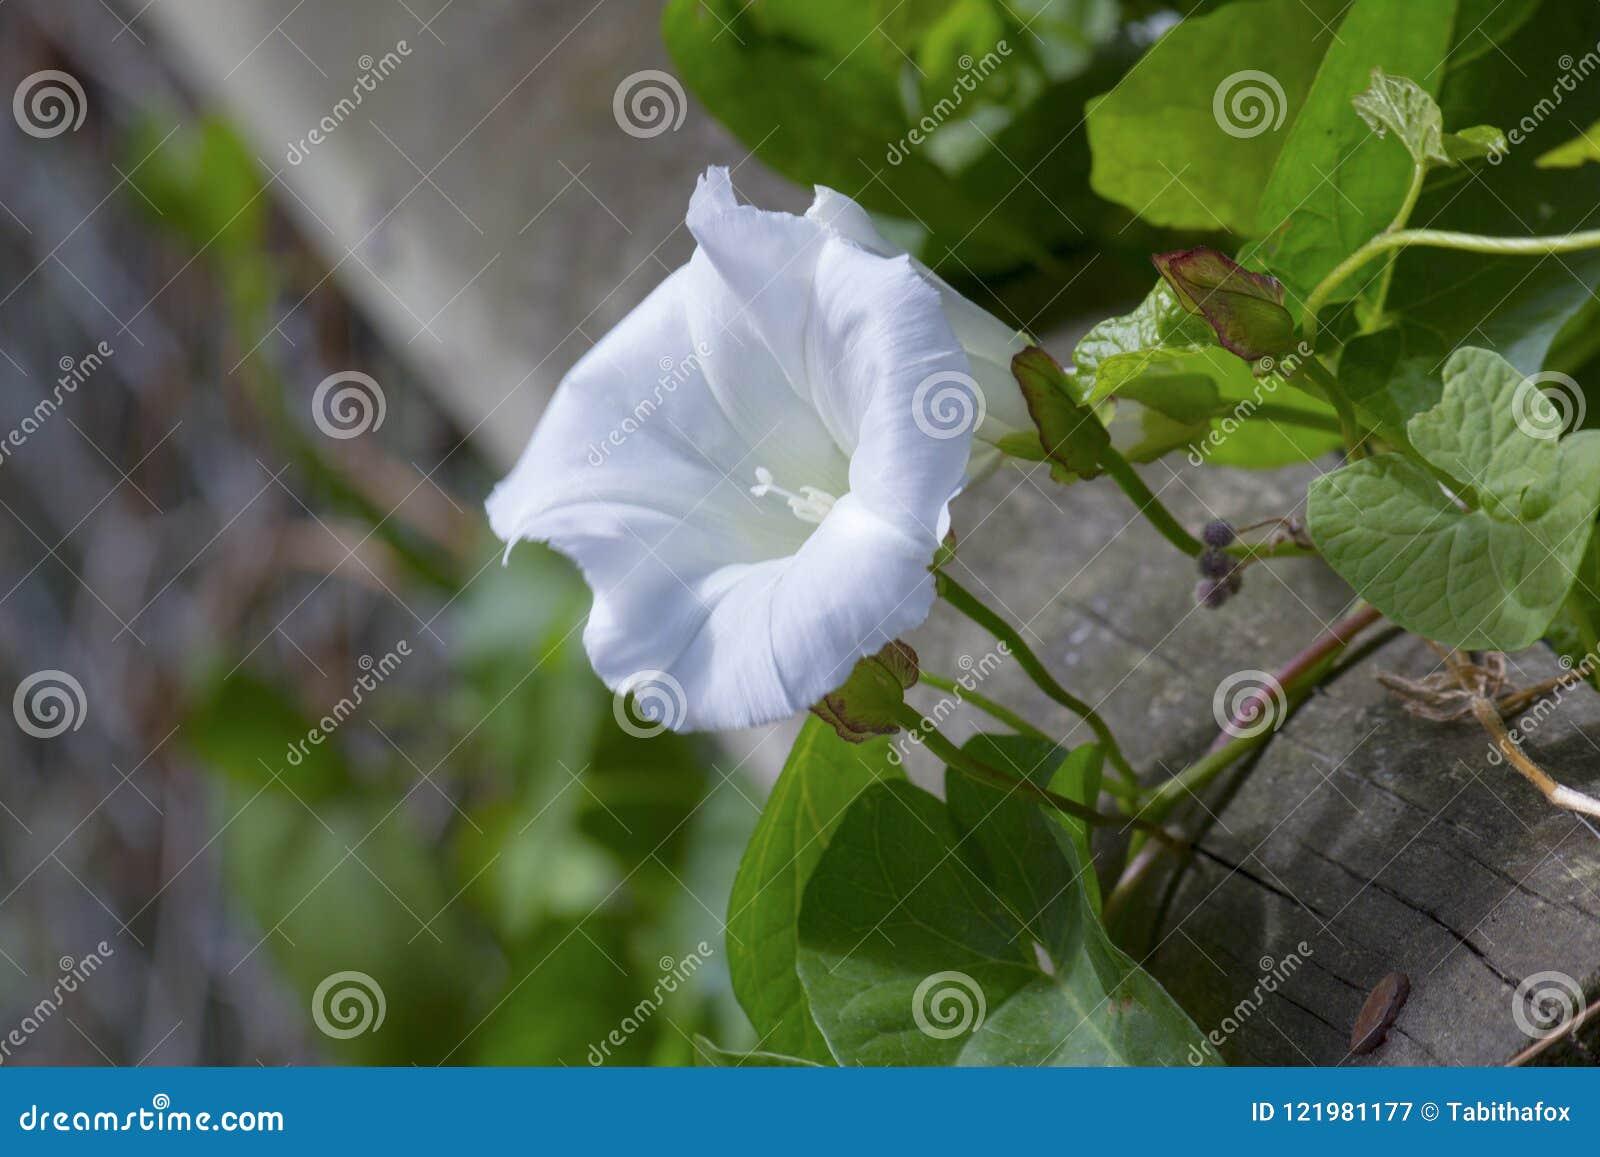 White Bind Weed Flower In Bloom Stock Image - Image of flower ...